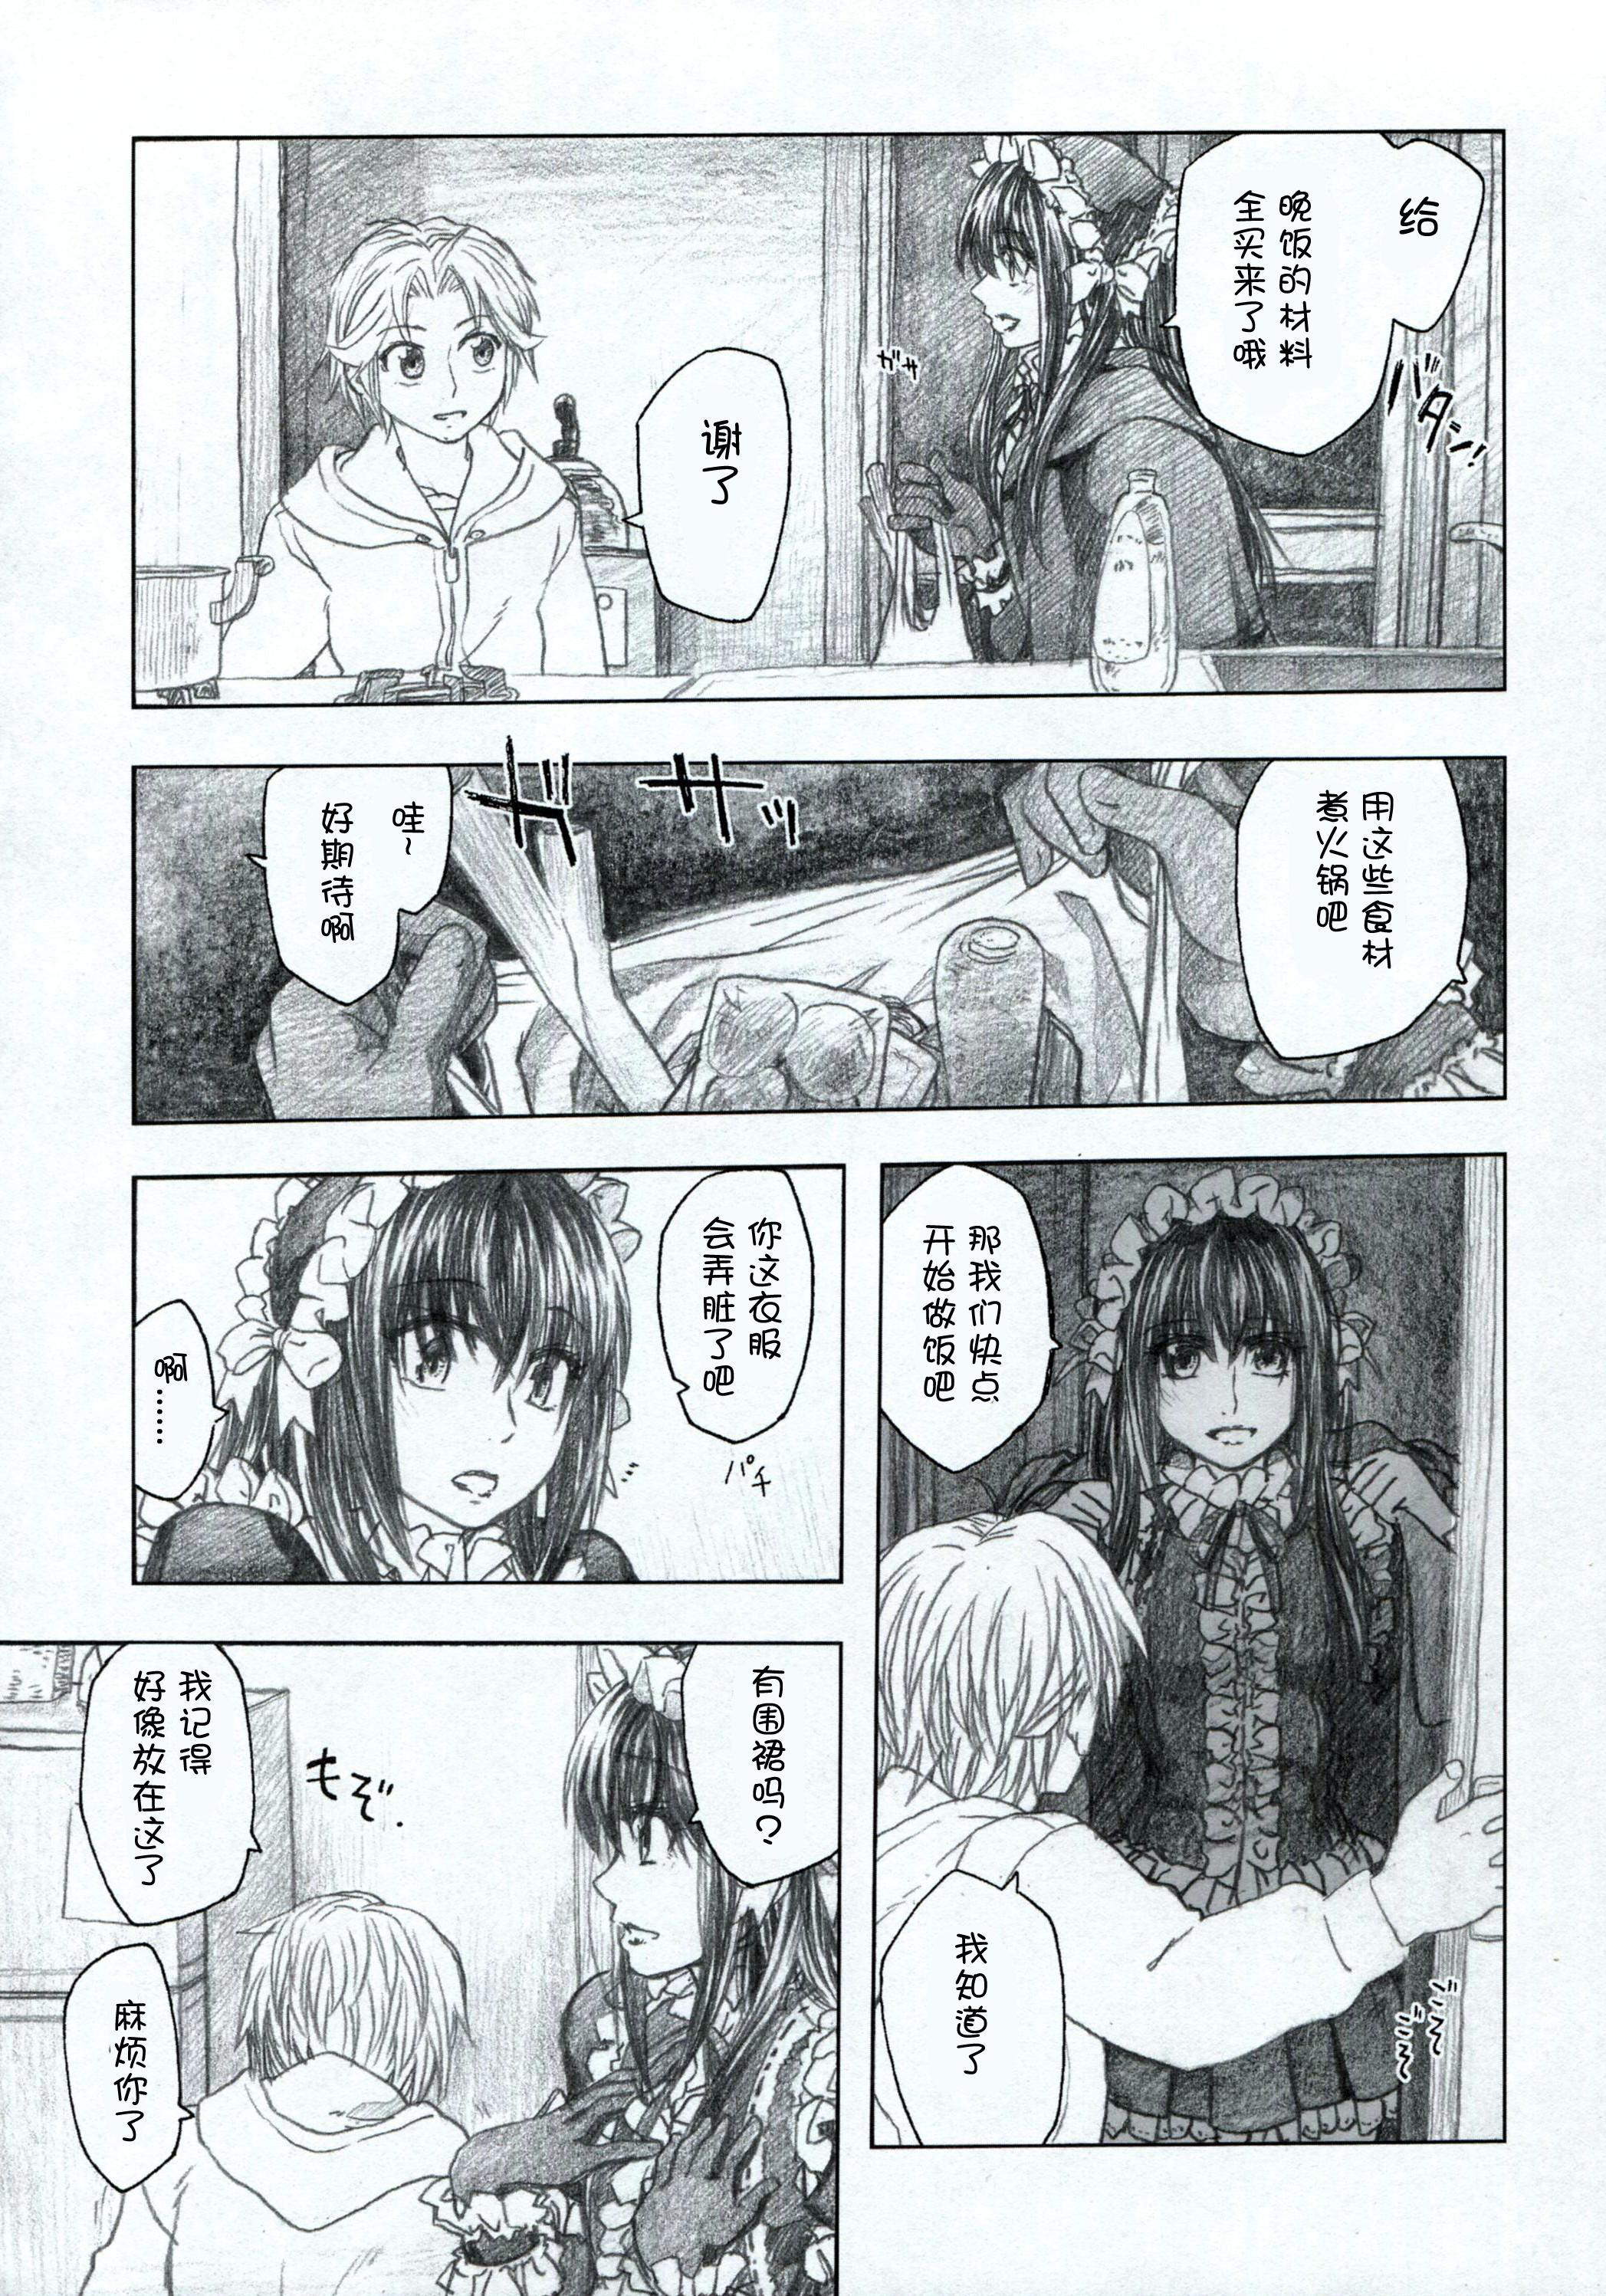 Moyashimon 2 TALES OF KEI Kei Hon 4